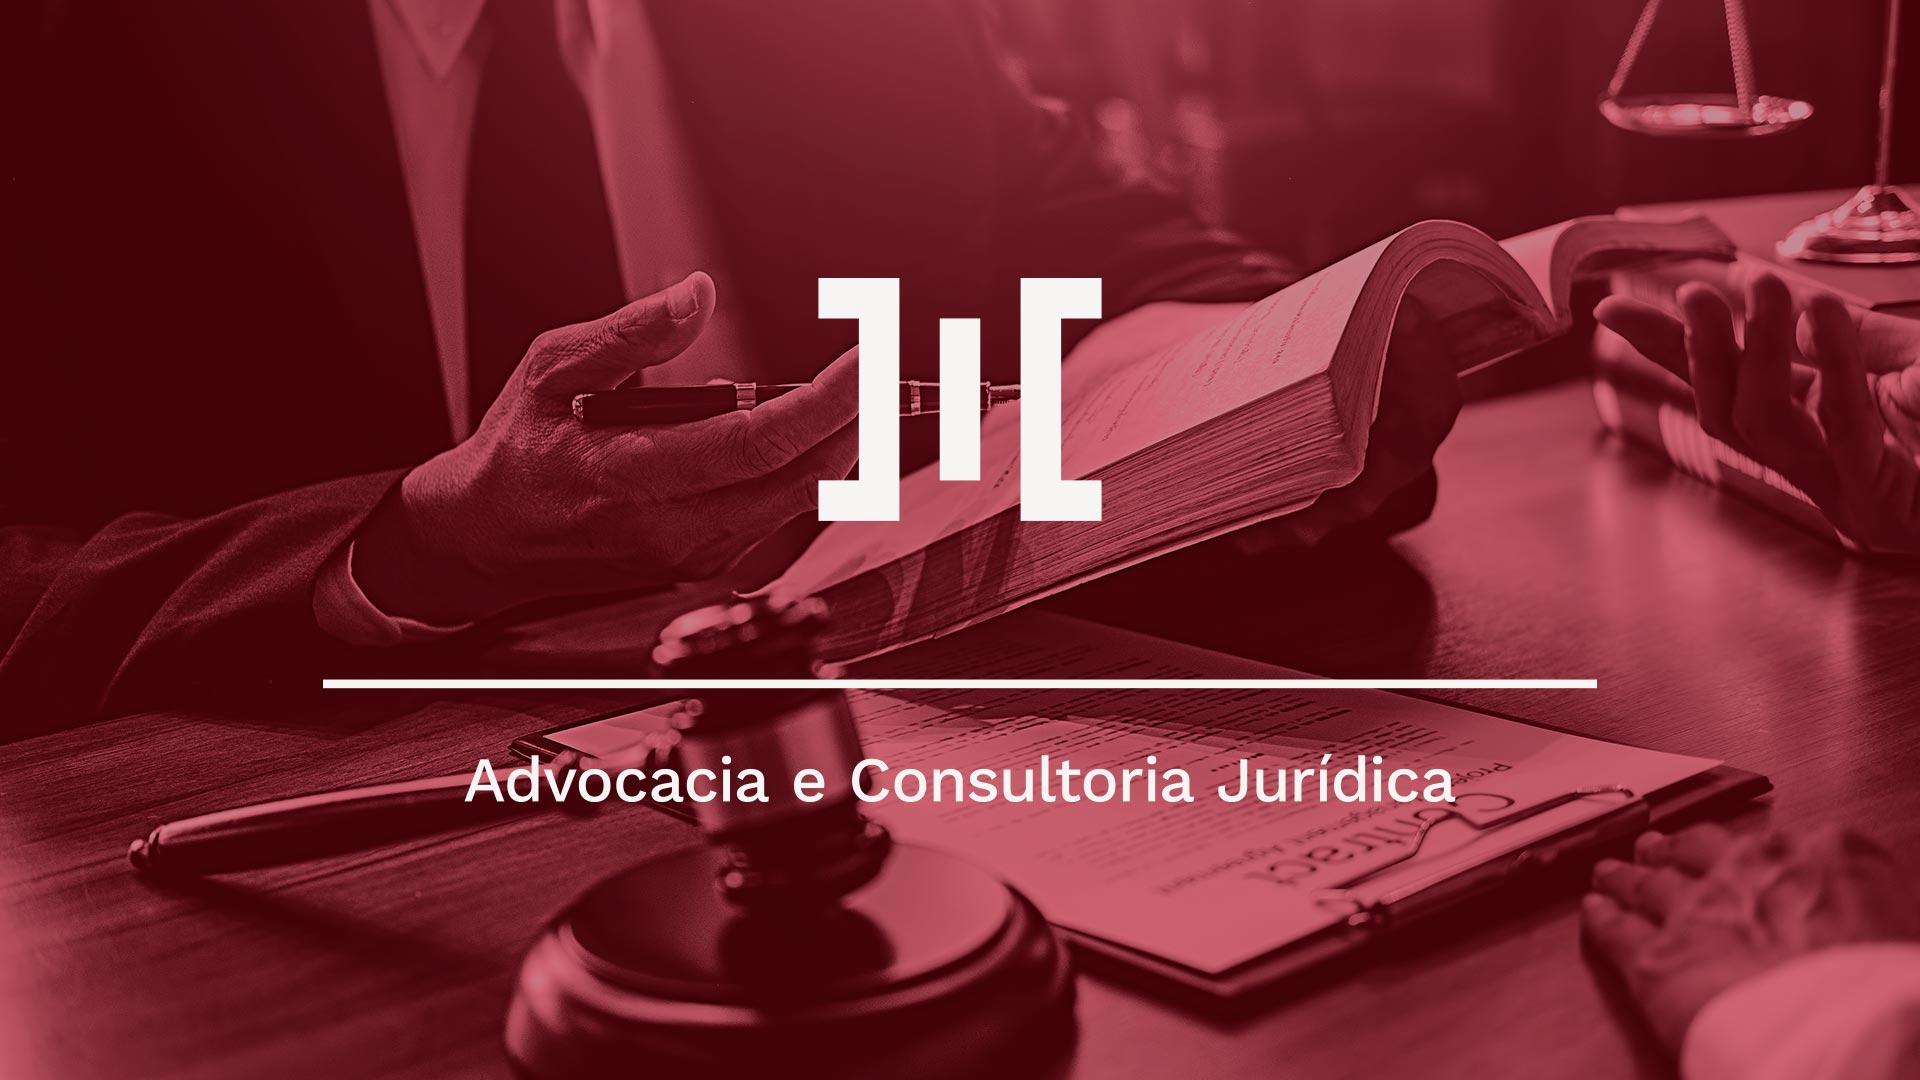 Hamilton Oliveira Advocacia e Consultoria Jurídica